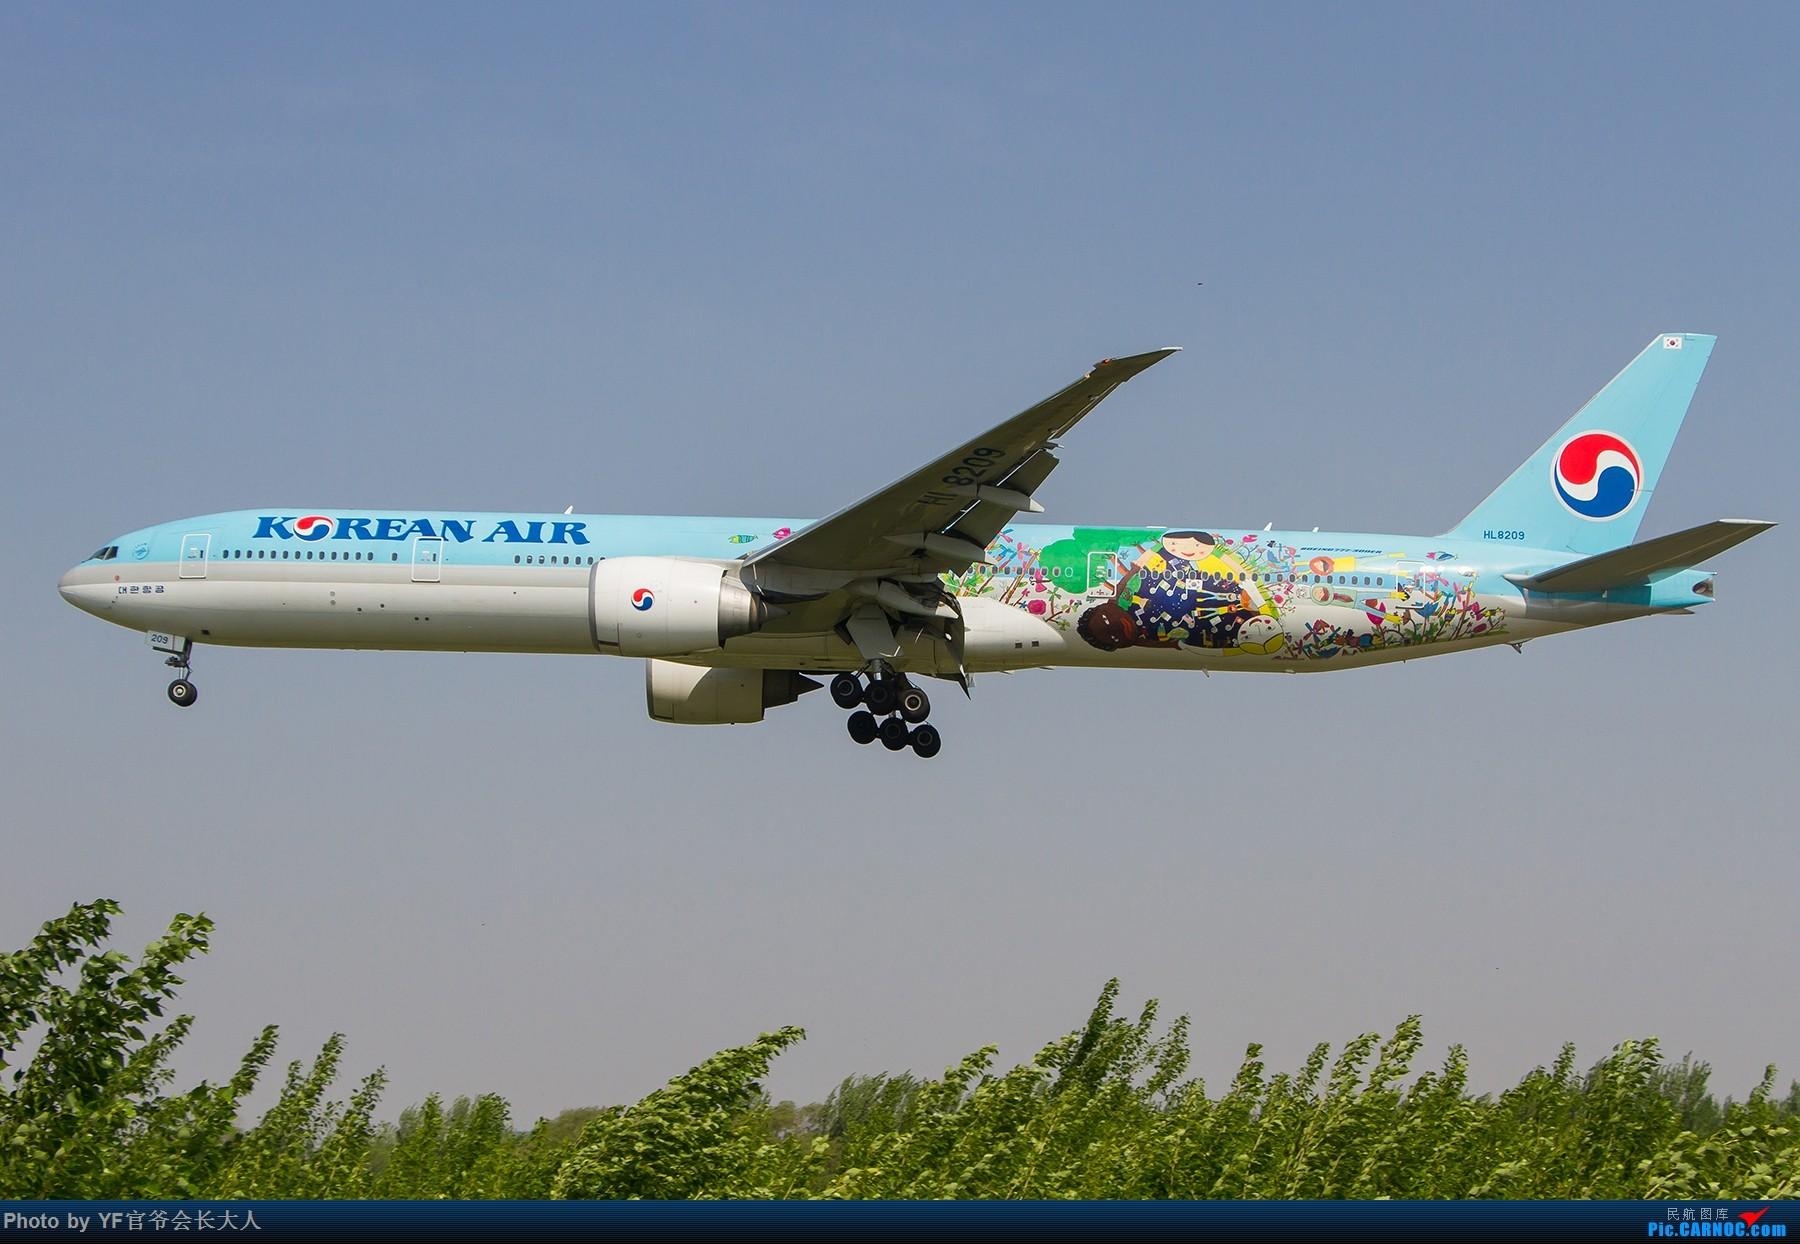 Re:[原创]【ZYTX】轻易不拍机,拍就要拍个过瘾!(新开的酷鸟,亚洲大西洋,顺带碰上朝韩两国的好货) BOEING 777-300ER HL8209 中国沈阳桃仙国际机场